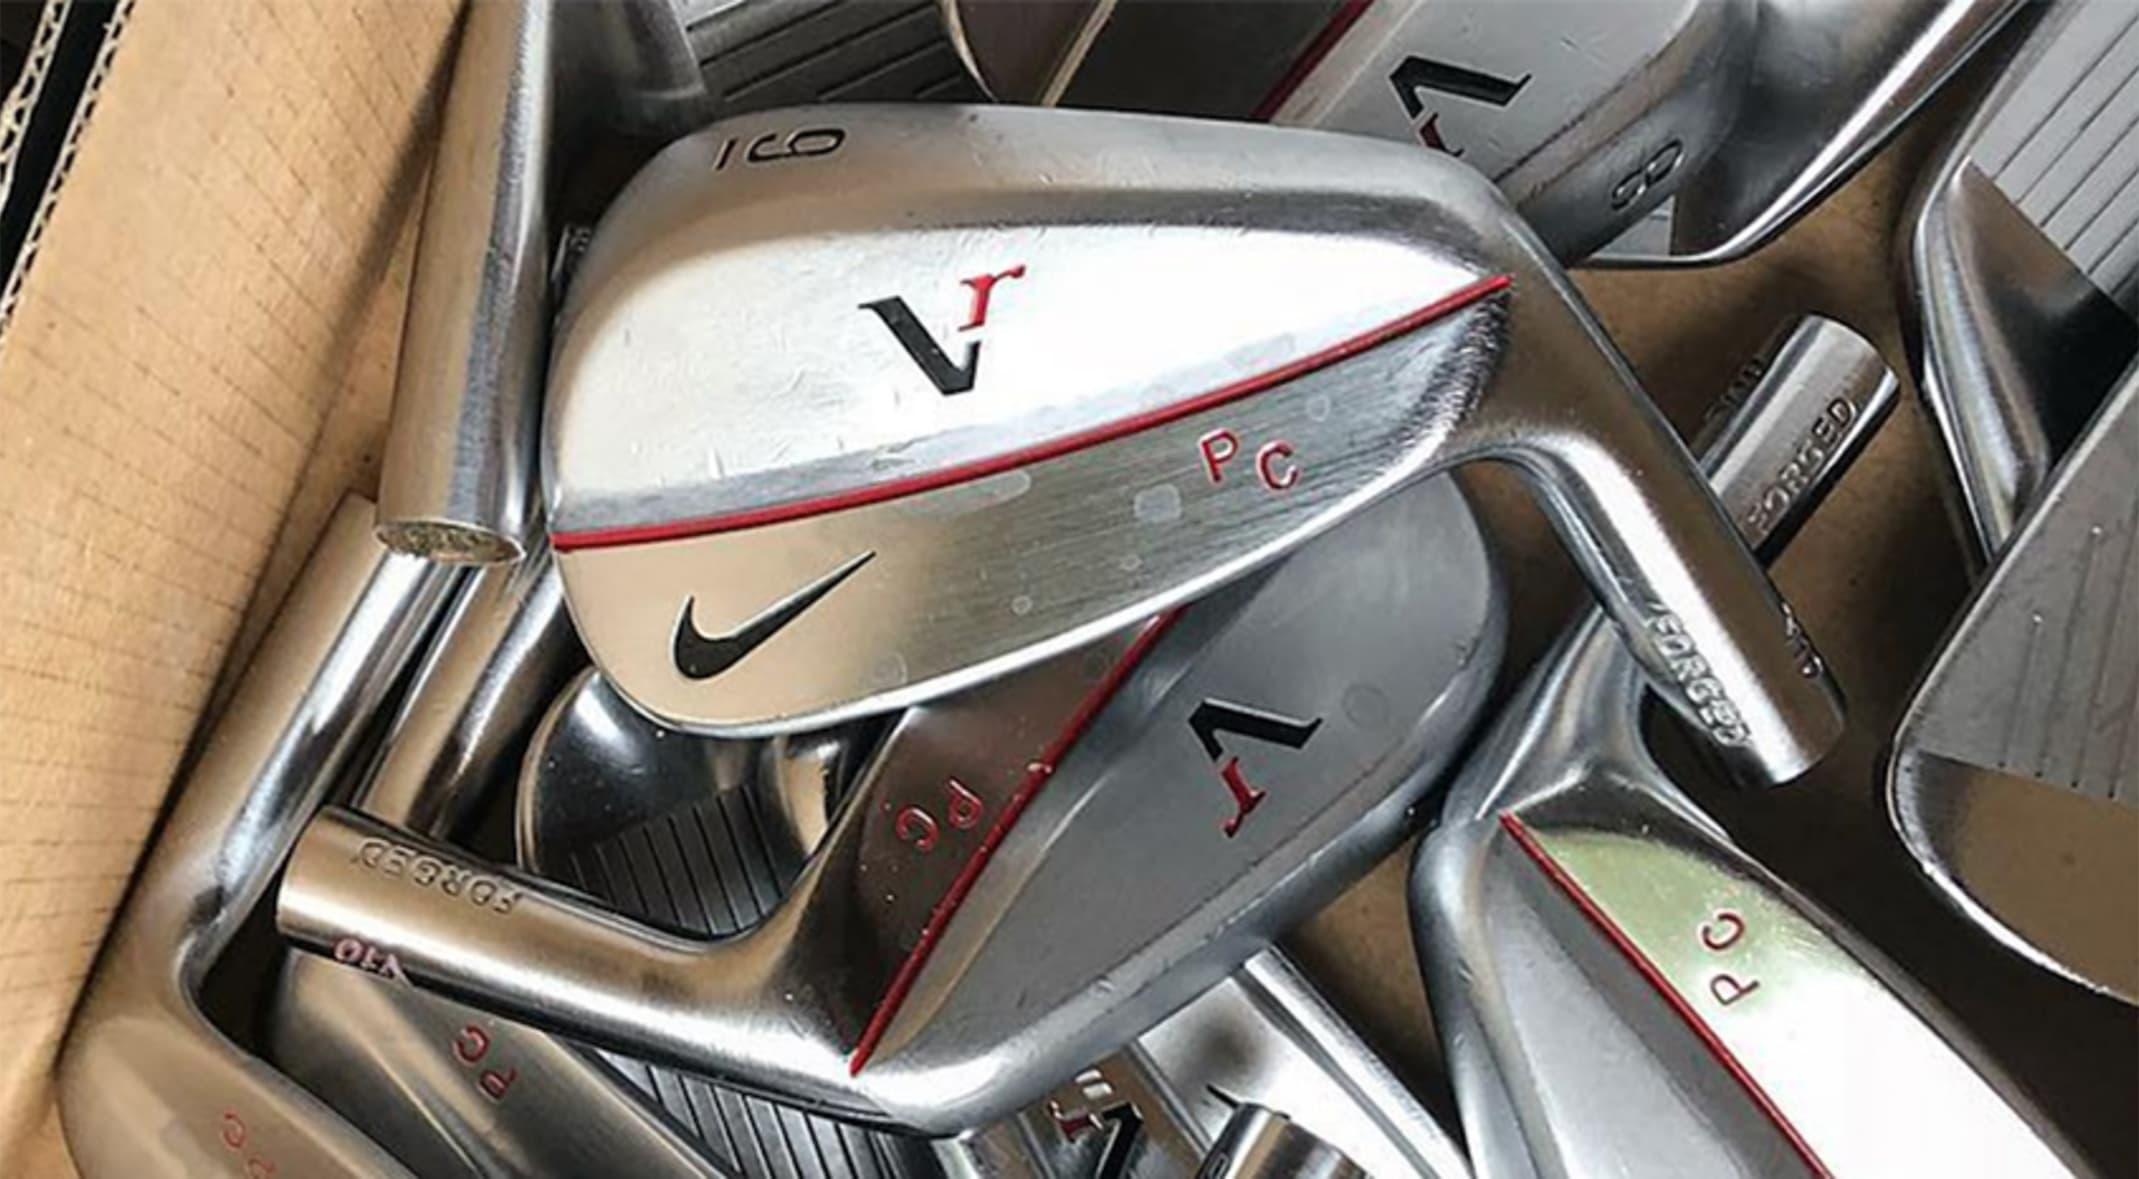 f751b2f1e69f5 A look at Paul Casey s popular set of Nike VR Pro blade irons. (Paul